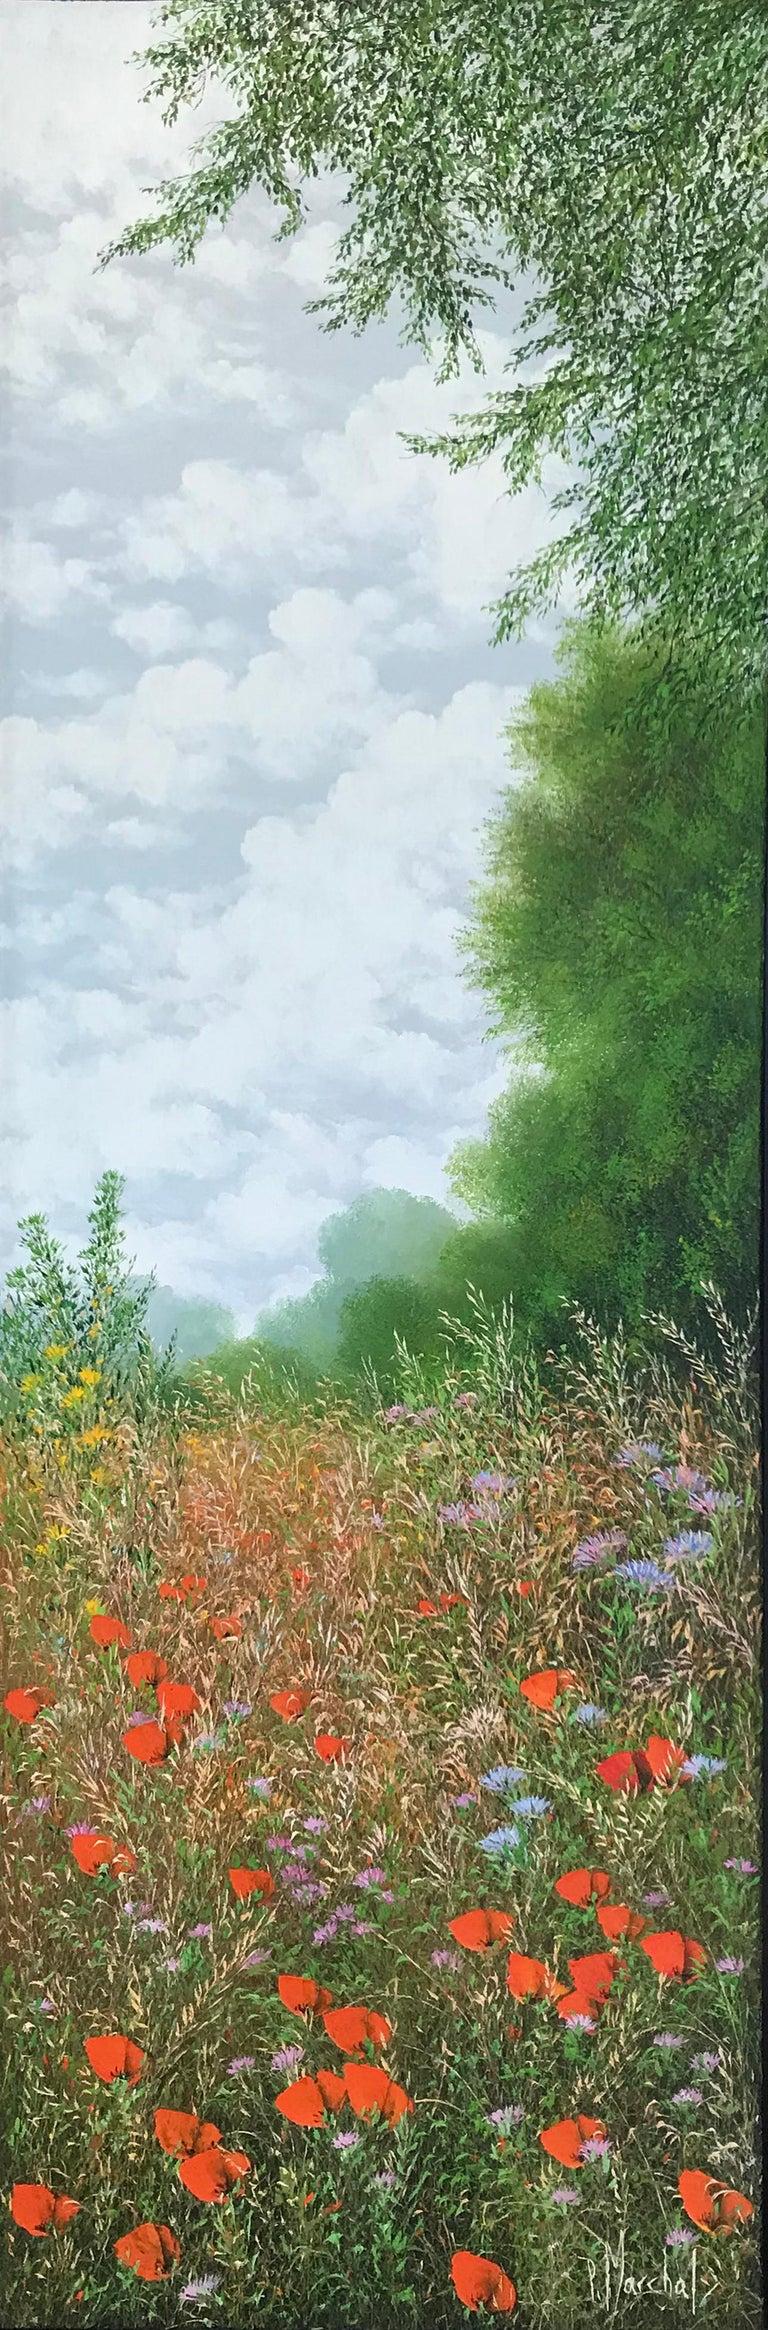 Patrice Marchal Landscape Painting - Eté, oil painting on canvas , size with frame 95.4 x 35.4 cm , 2019